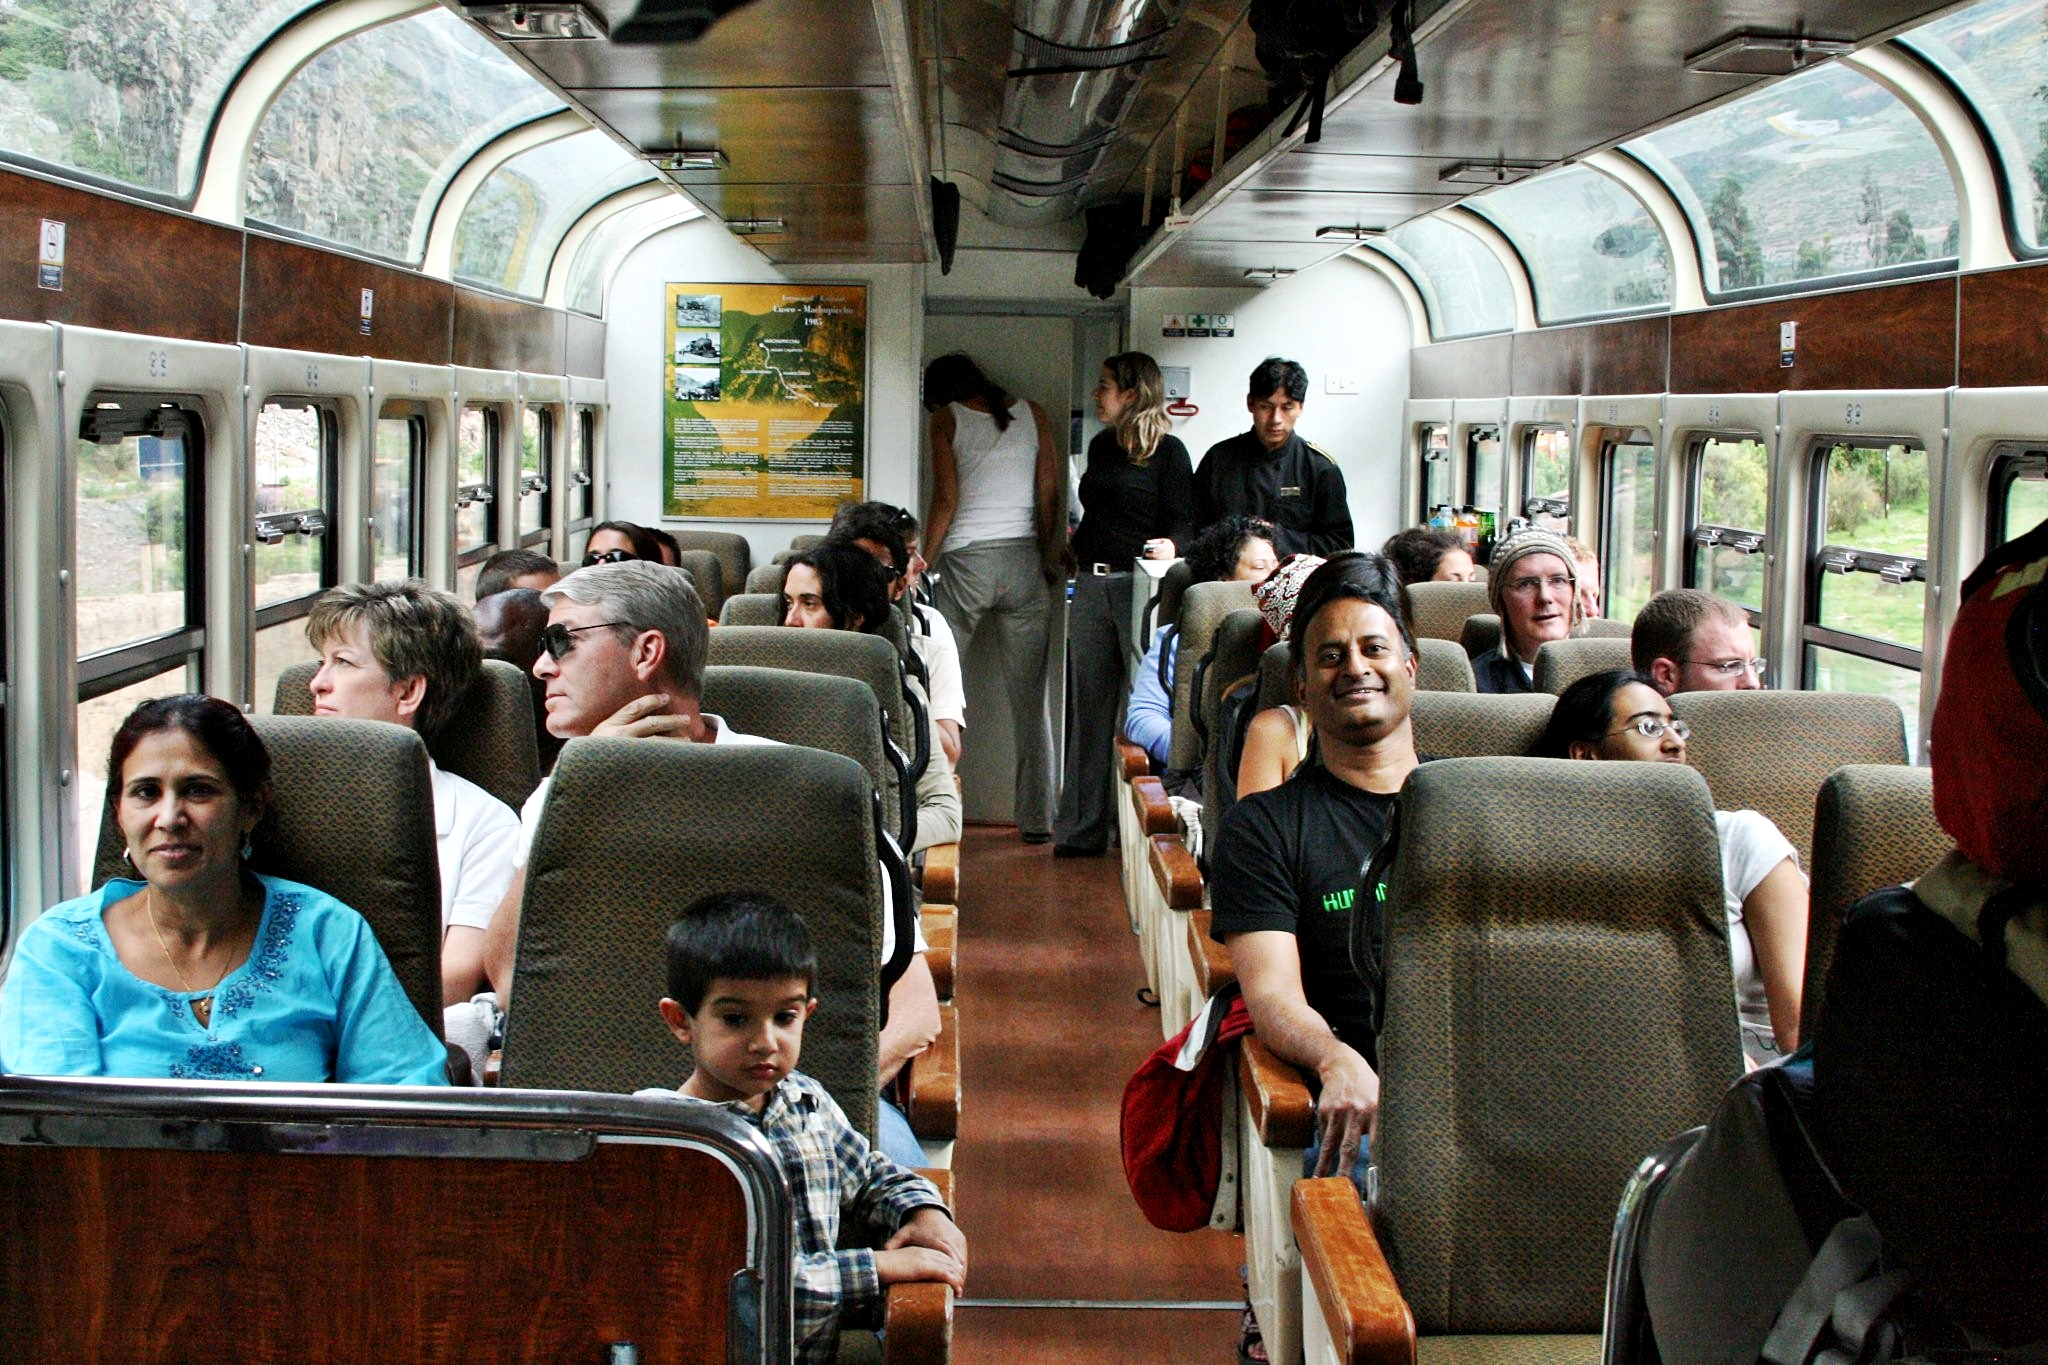 Peru Travel Tips: Taking the Train to Machu Picchu